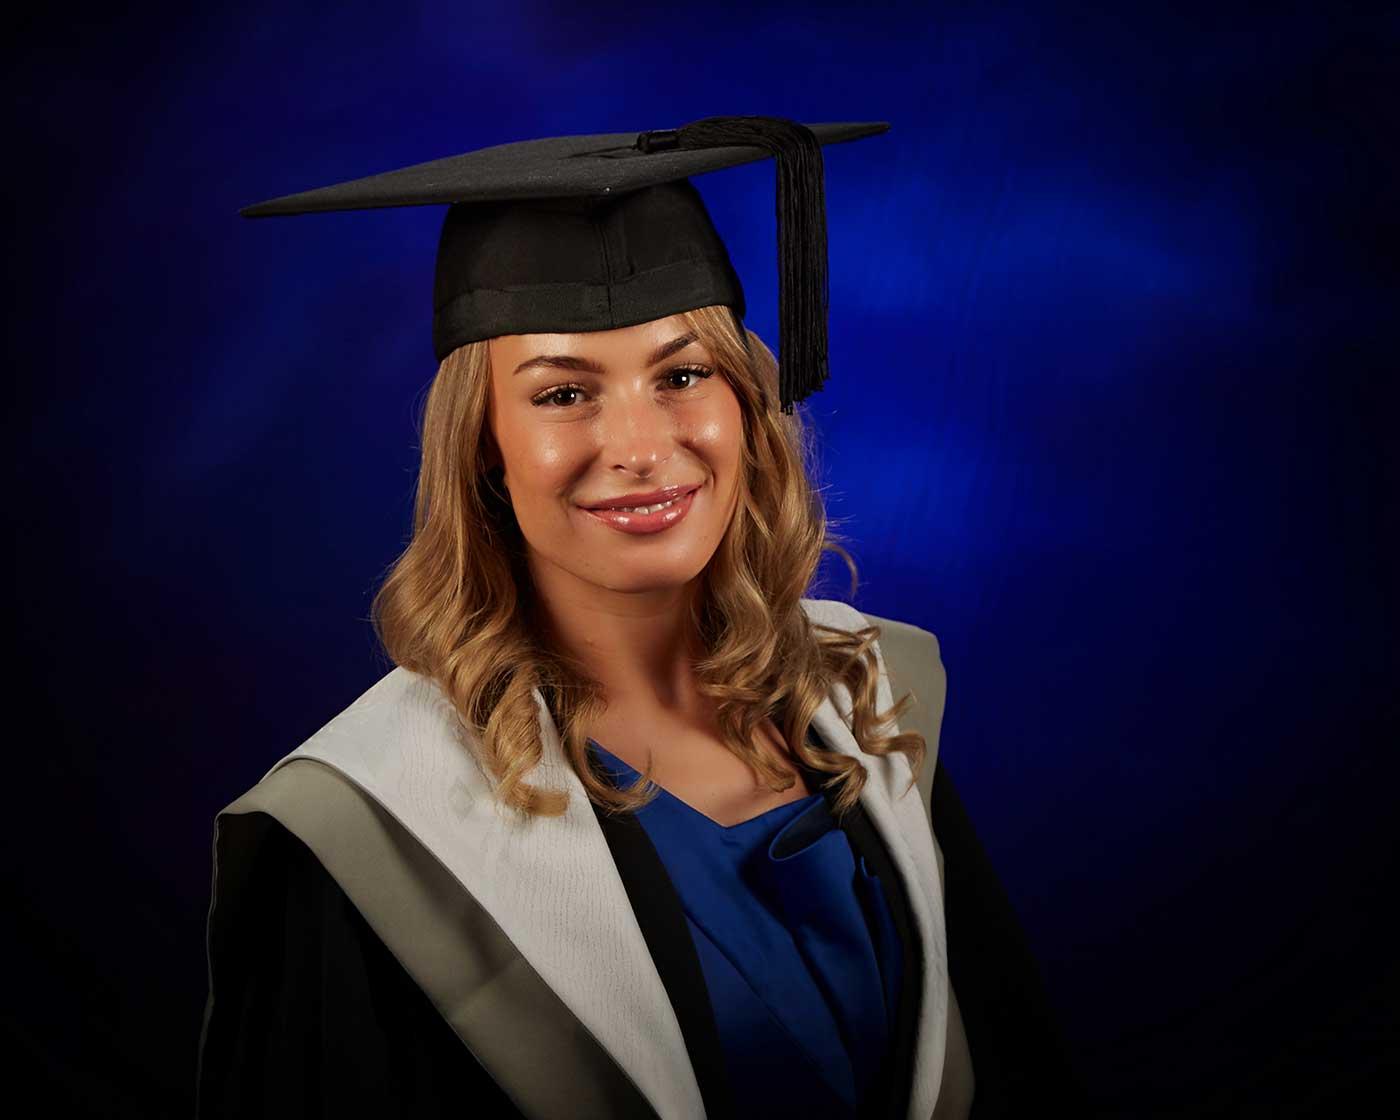 Graduation Photographers in London - row1